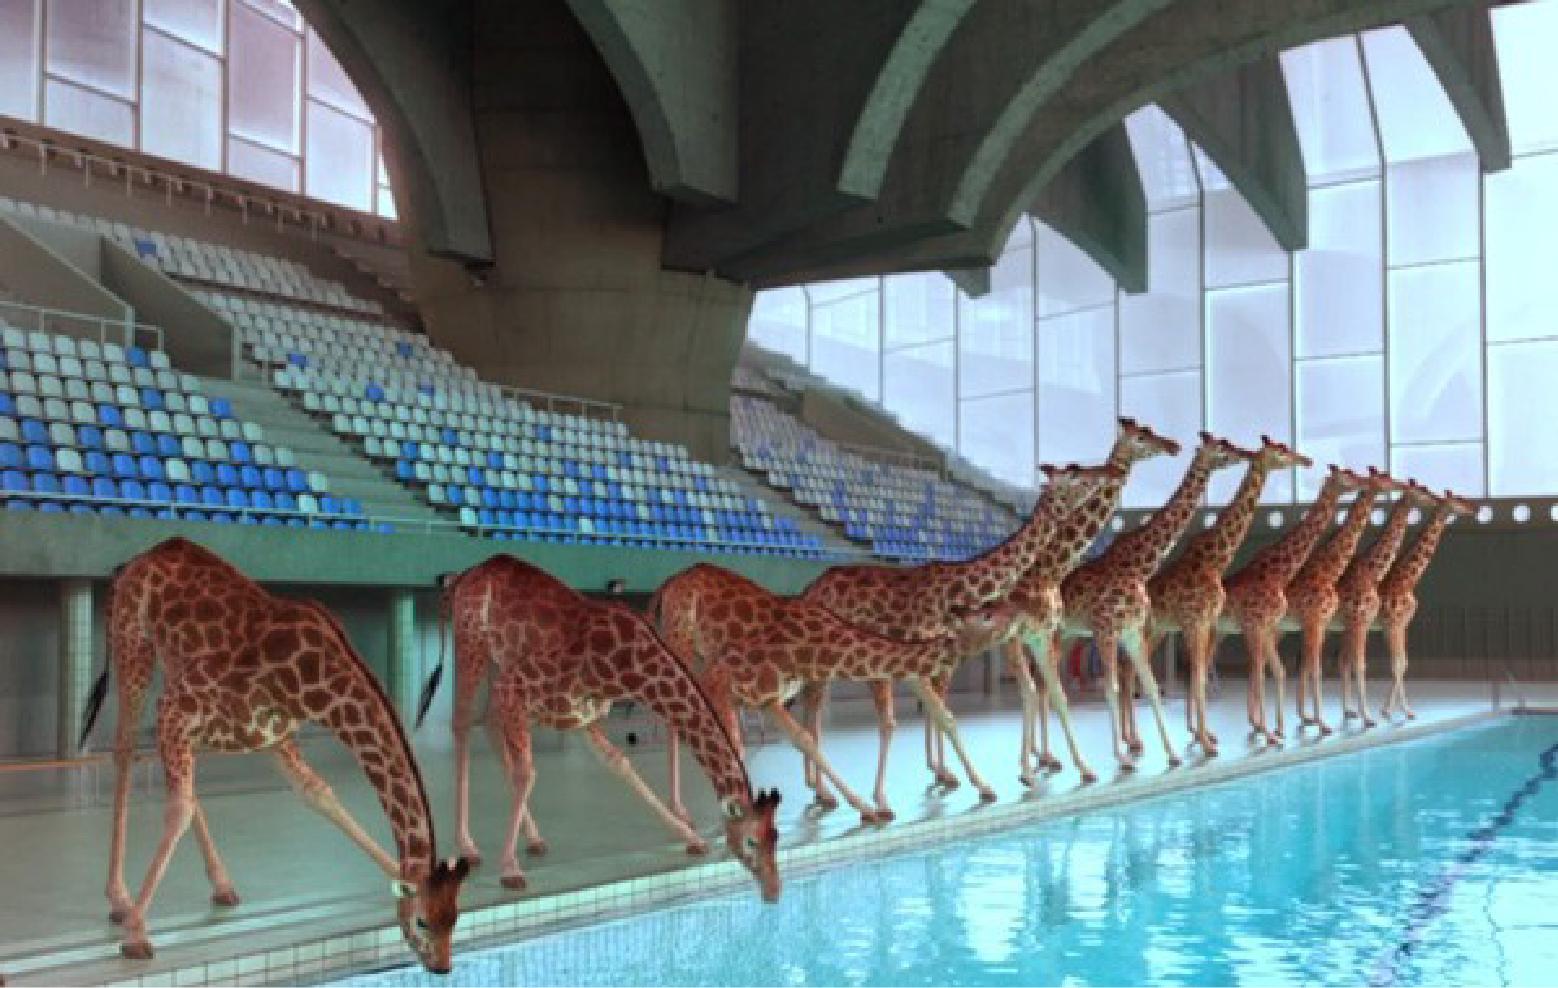 cgi-giraffen-600x377lkh-01